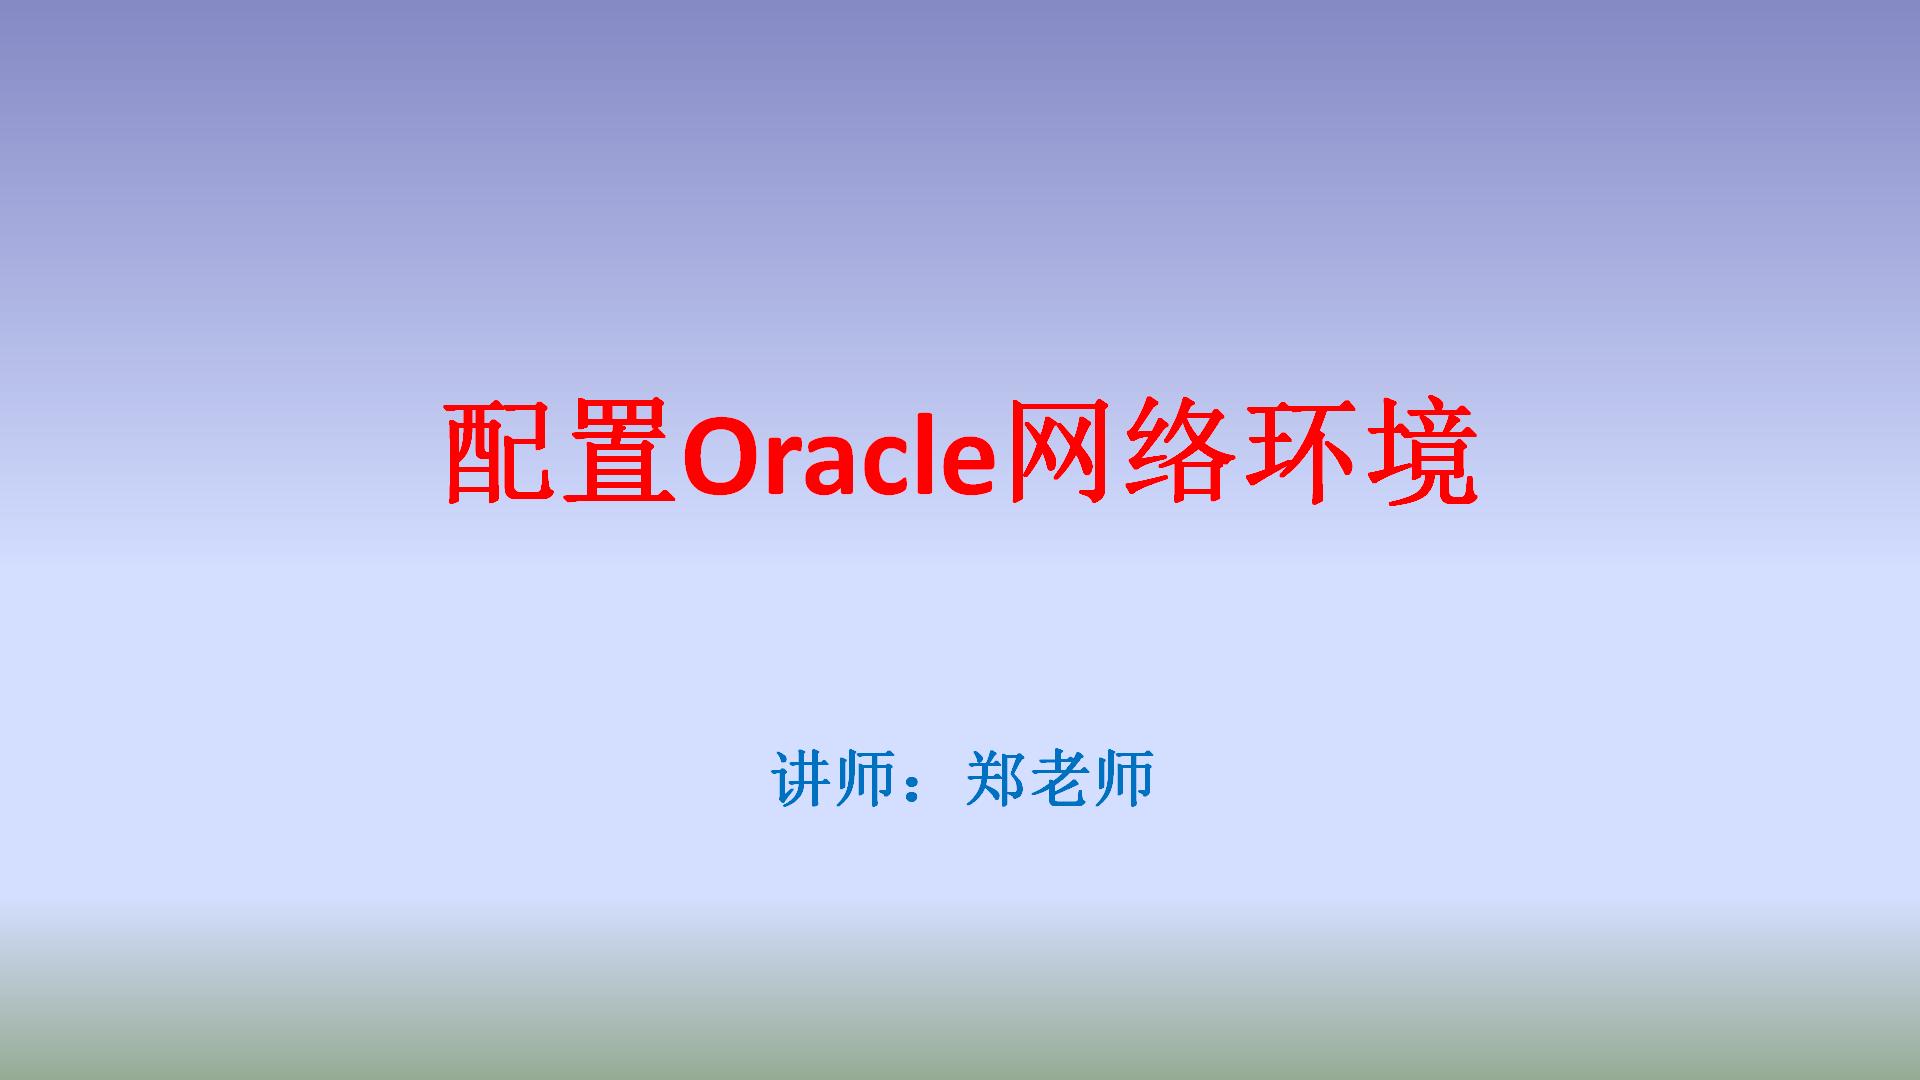 Oracle12数据库网络管理视频课程